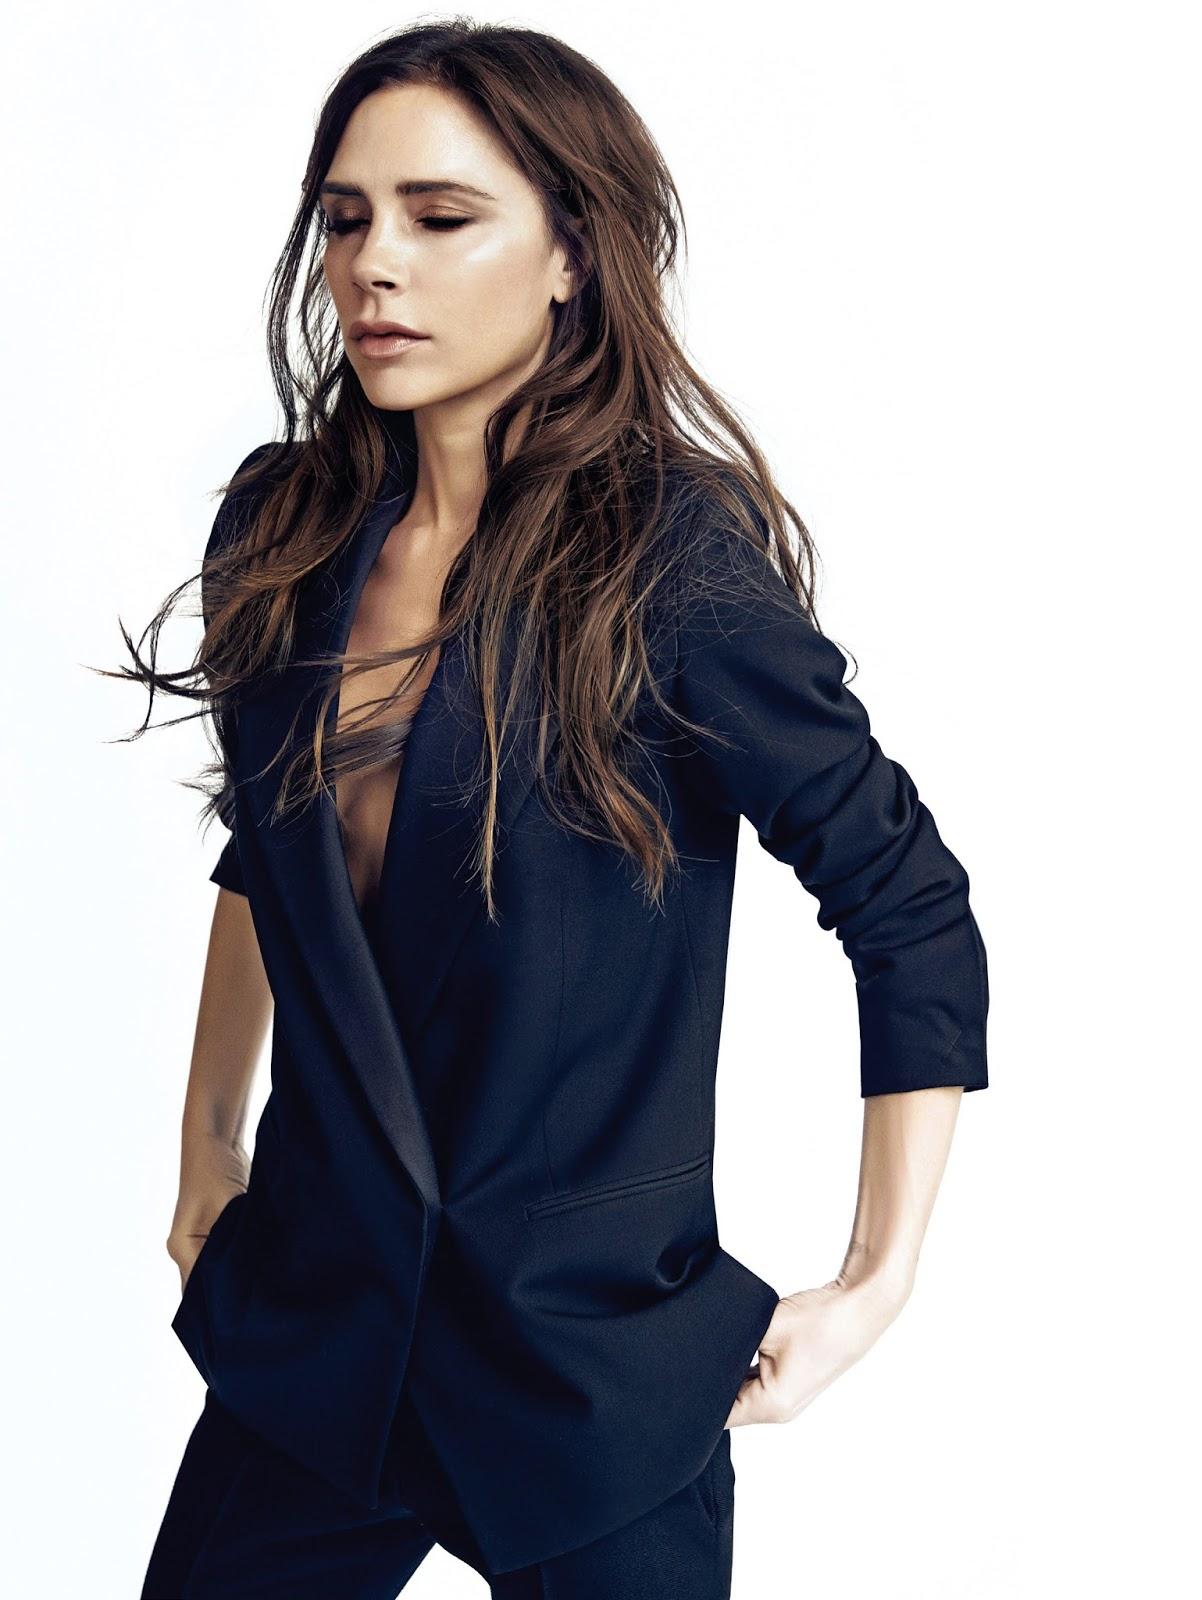 Victoria Beckham in Vogue Korea July 2016 by Hyea Won Kang Victoria Beckham